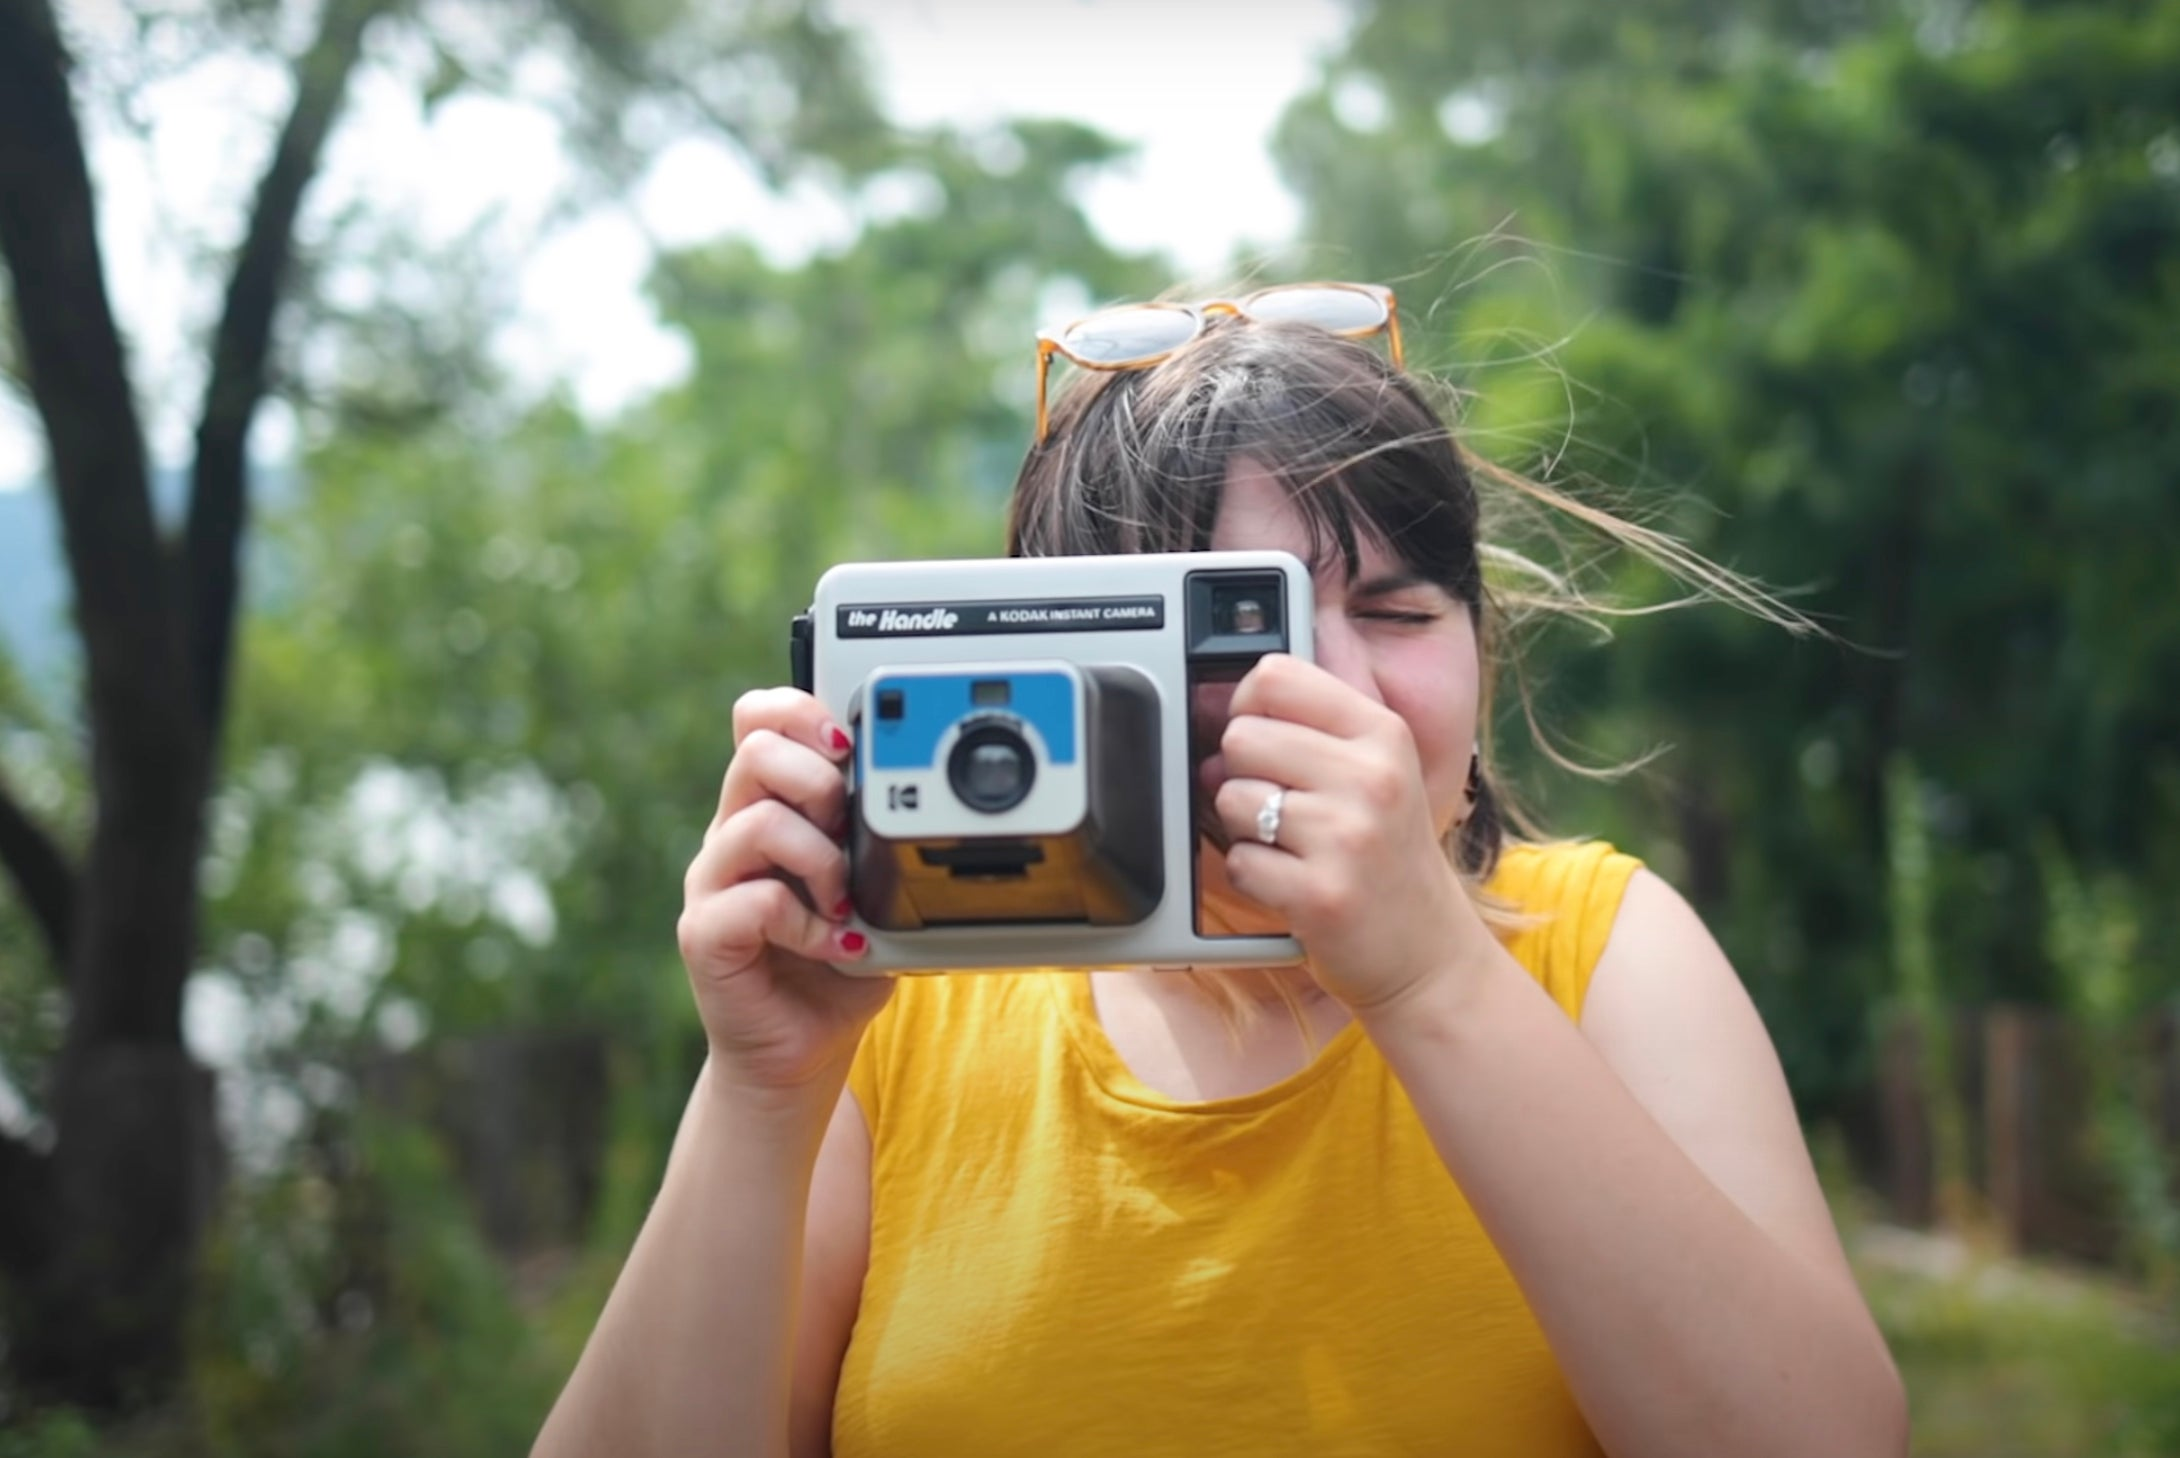 The Kodak Handle instant camera